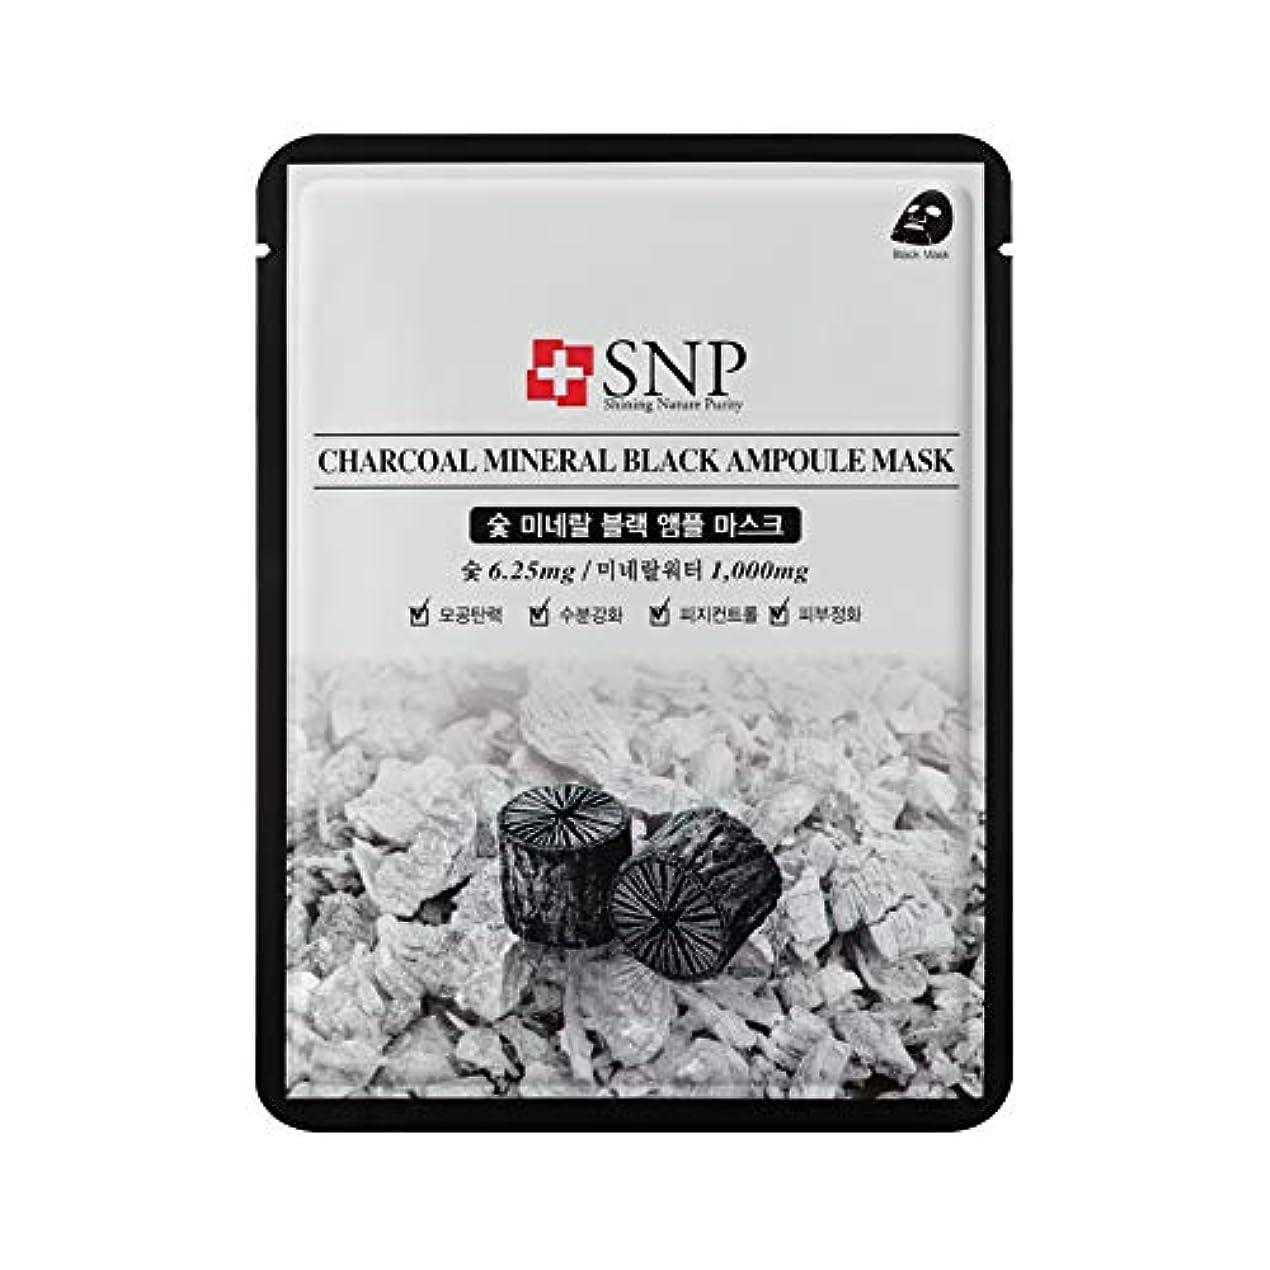 【SNP公式】 炭ミネラルブラックアンプルマスク10枚セット / Charcoal Mineral Black Ampoule Mask 25ml 韓国コスメ 韓国パック フェイスマスク マスクパック 保湿